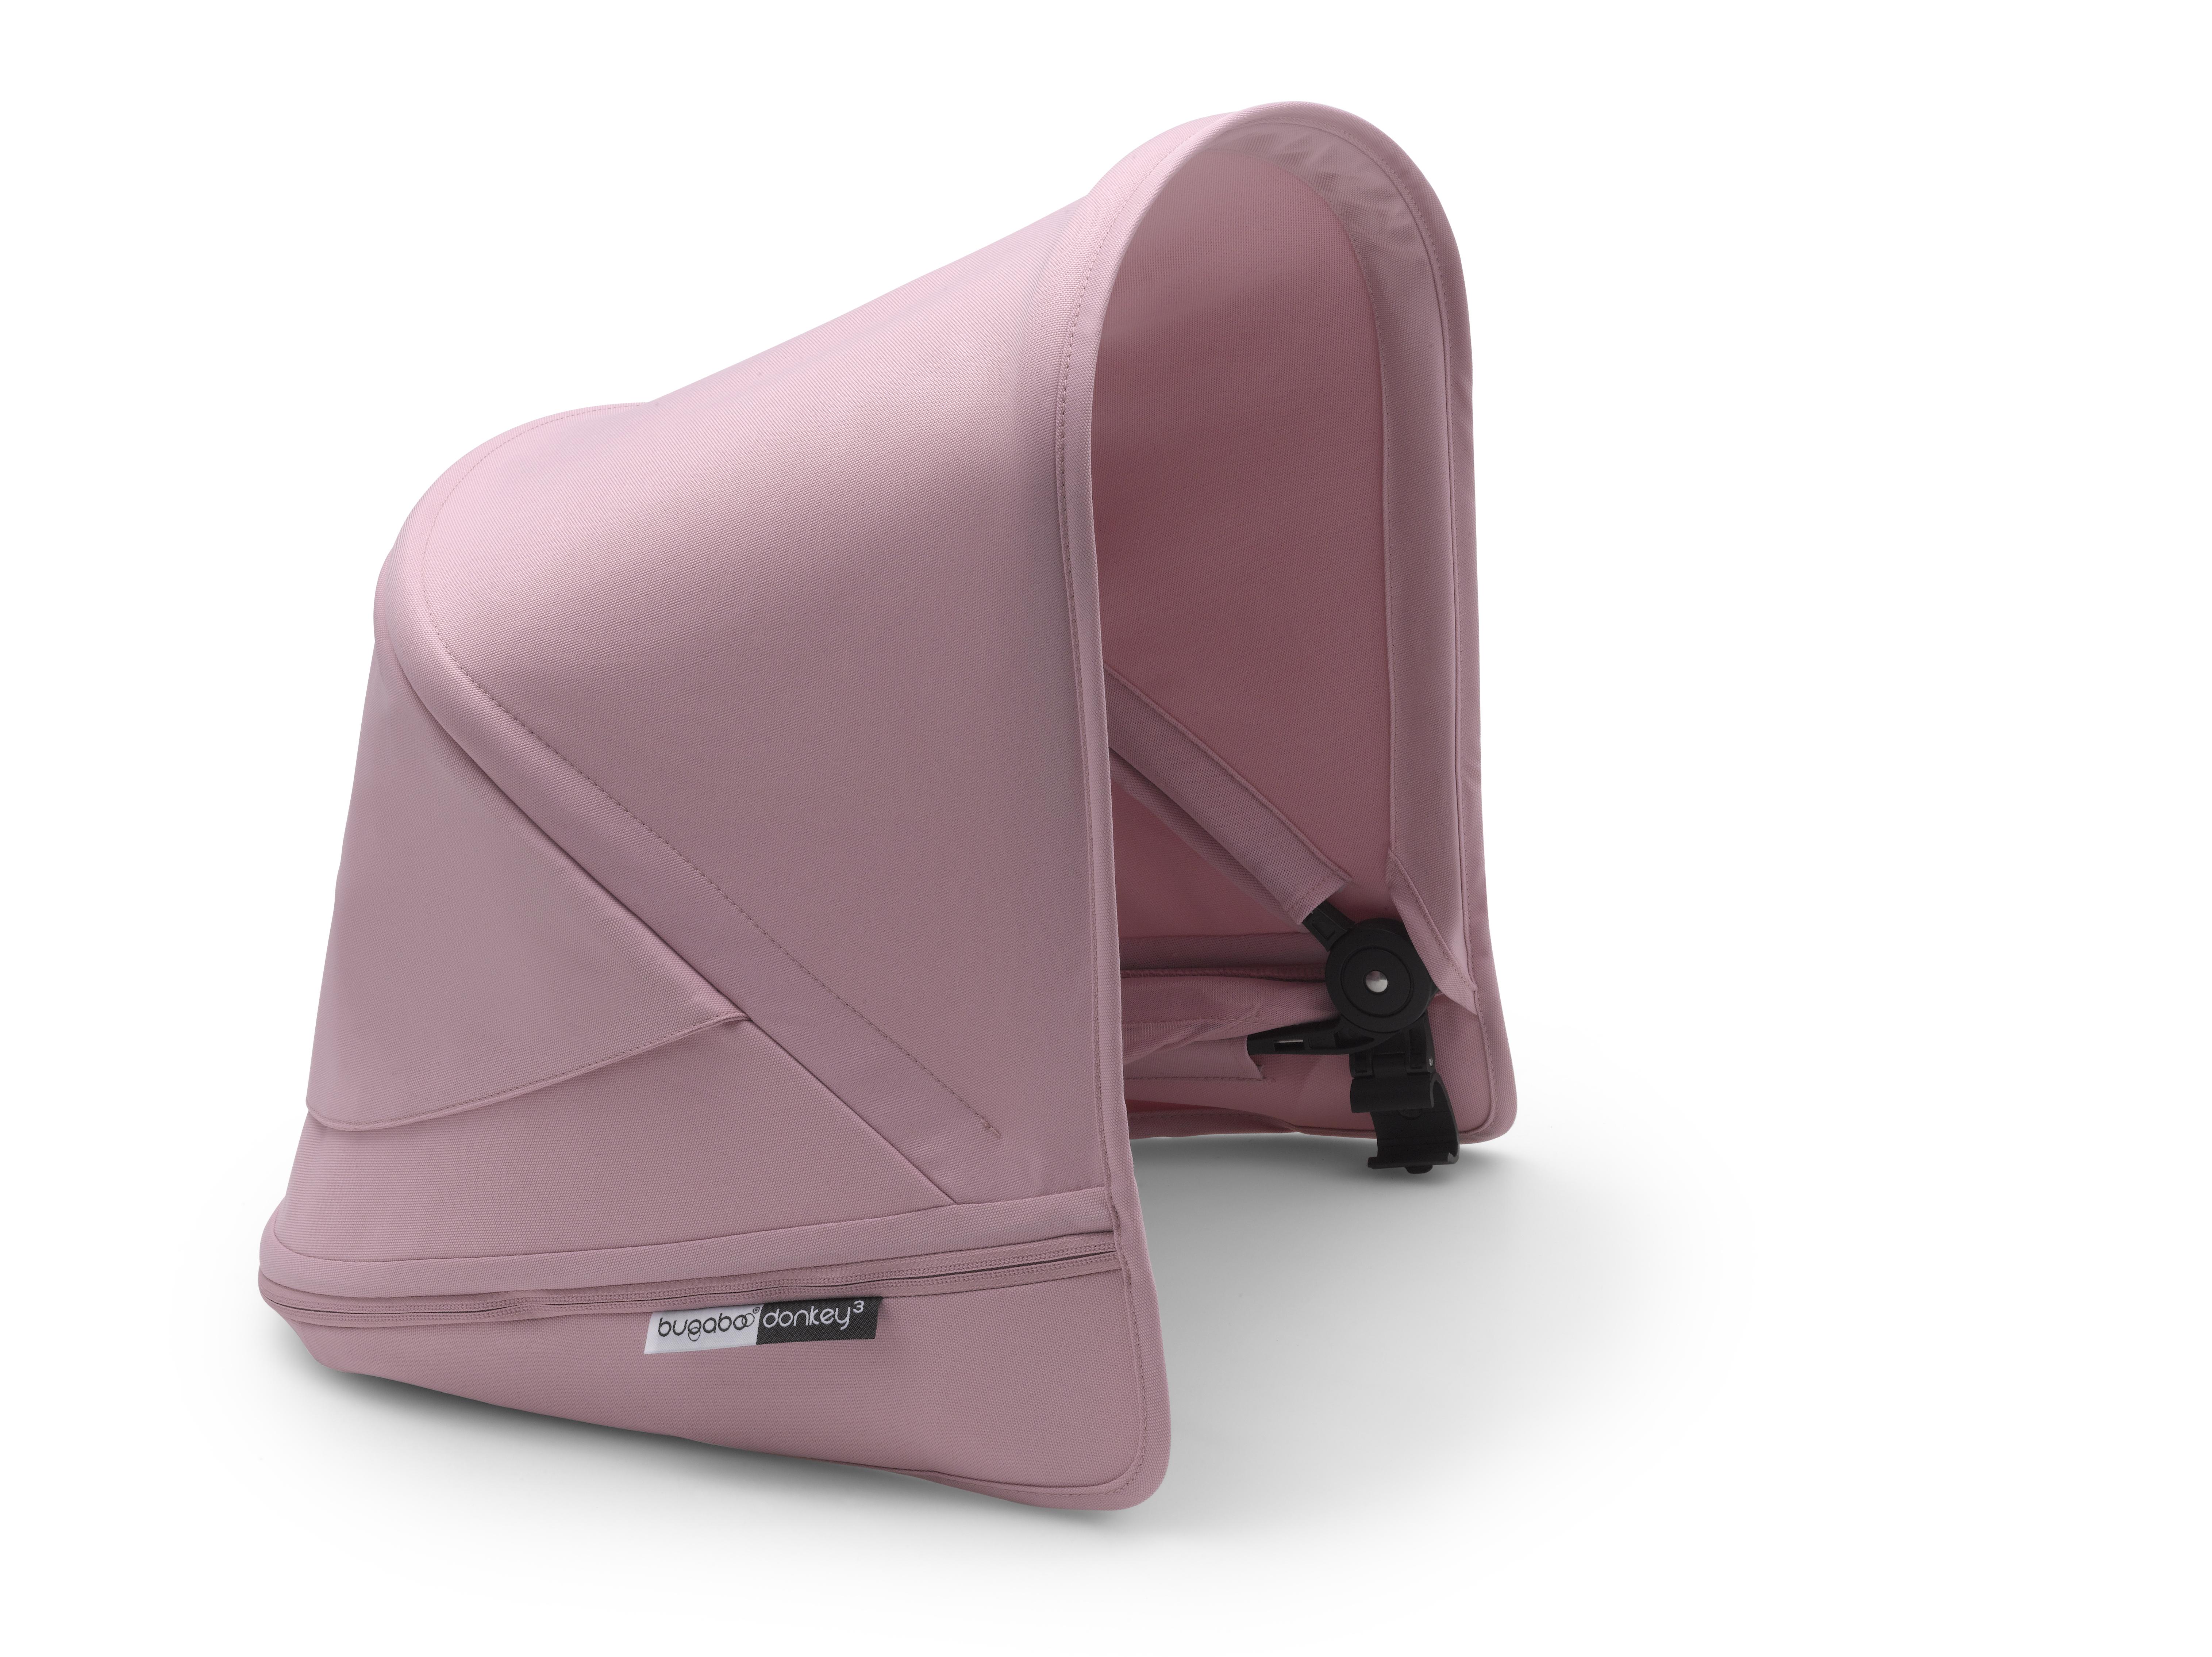 BGB_Donkey3_sun-canopy_soft-pink